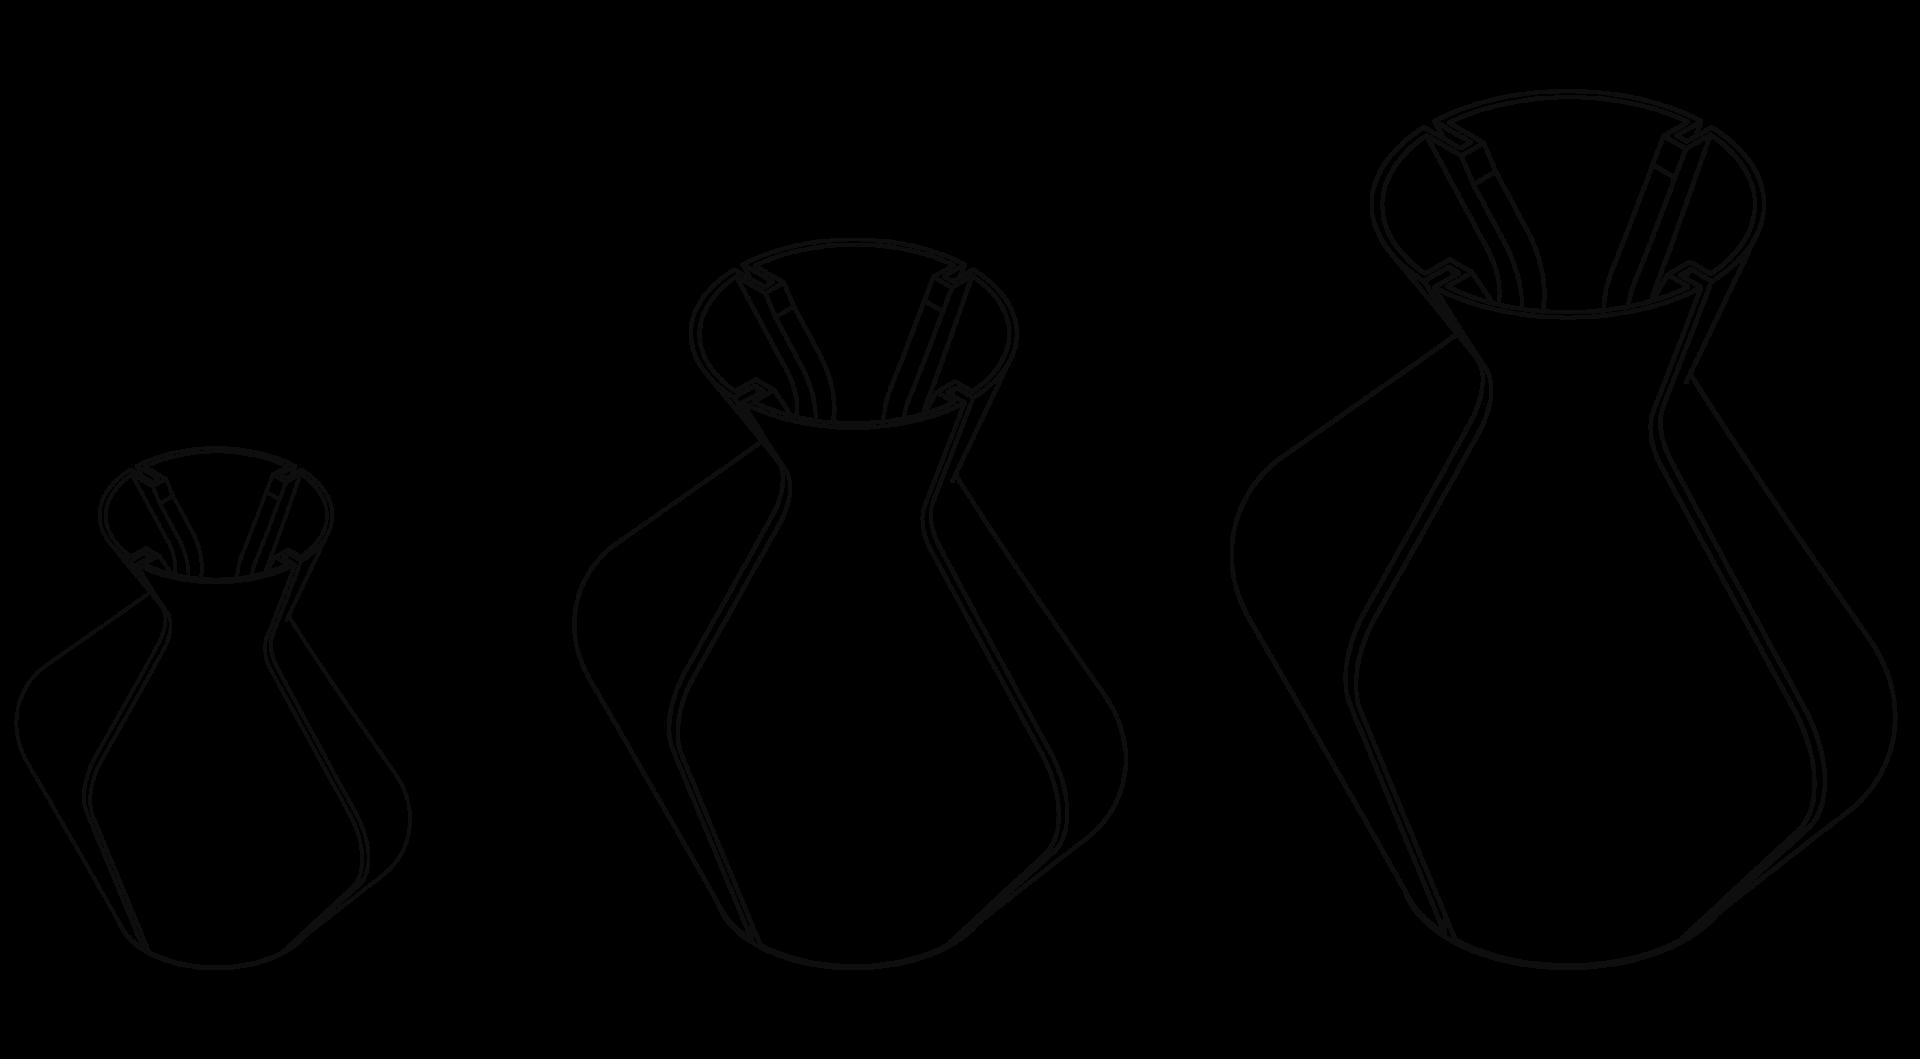 Changing vases line